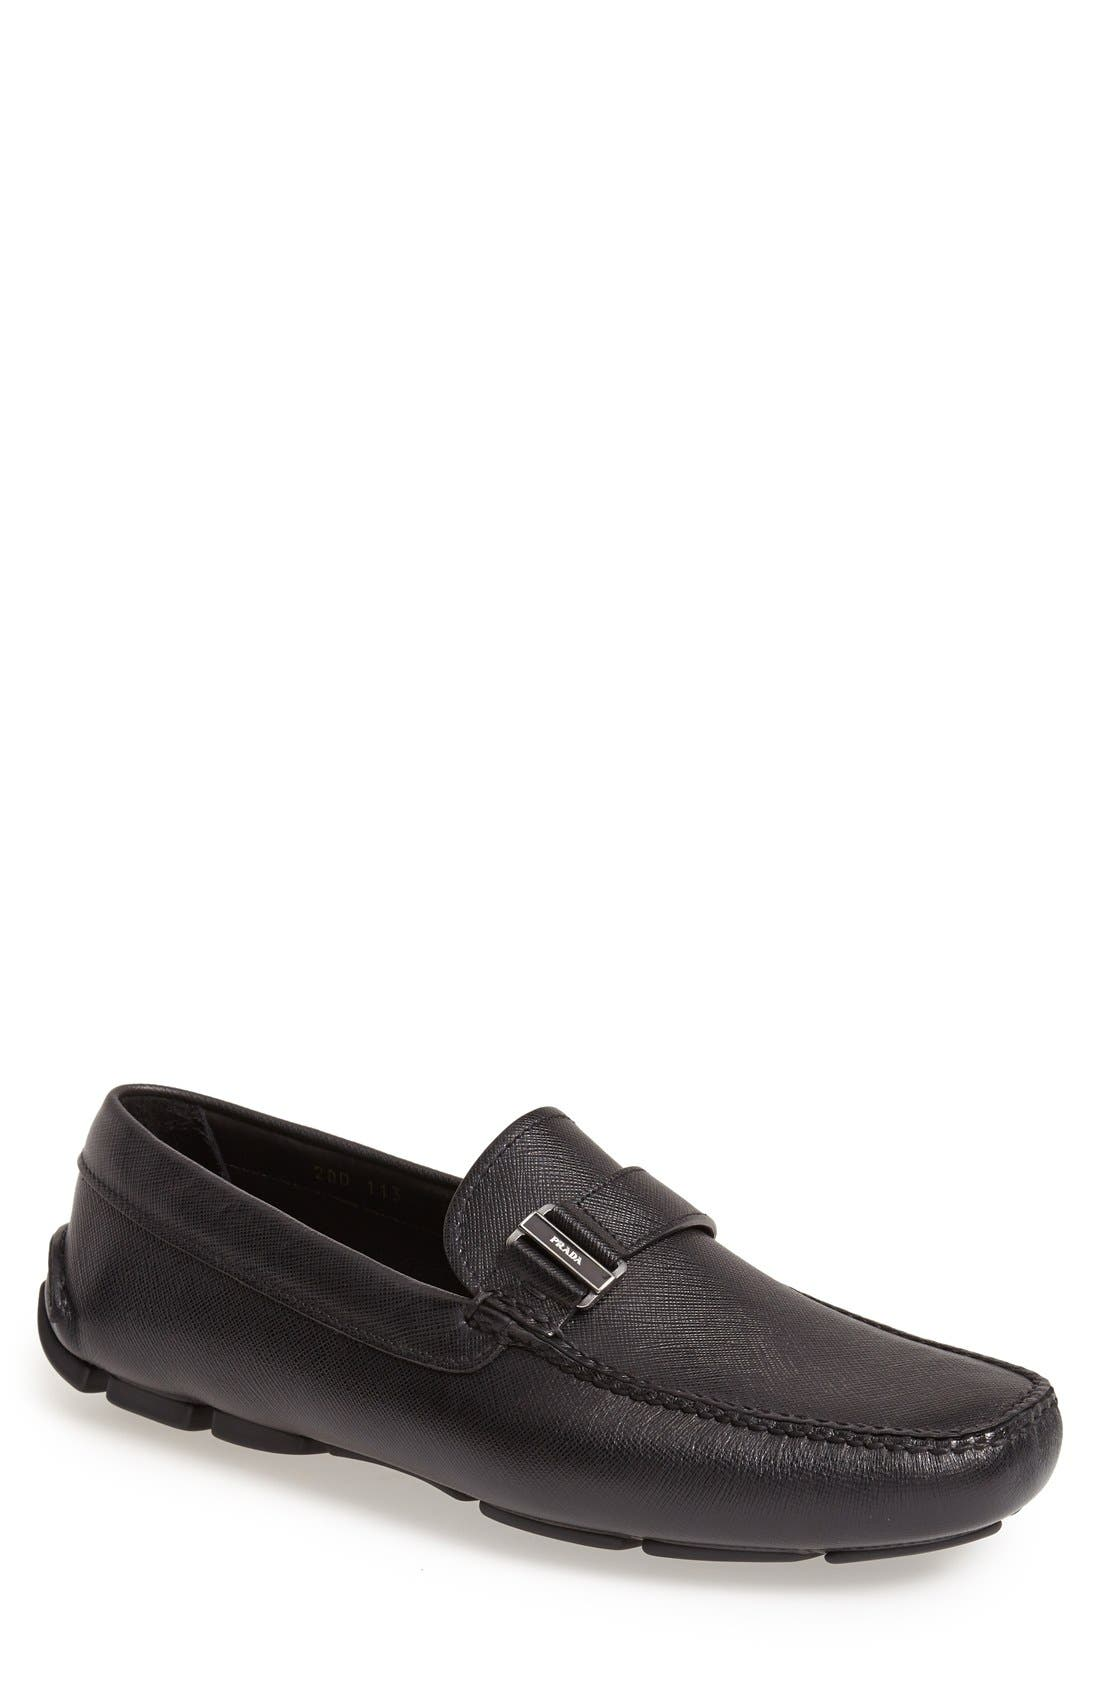 PRADA Saffiano Leather Driving Shoe